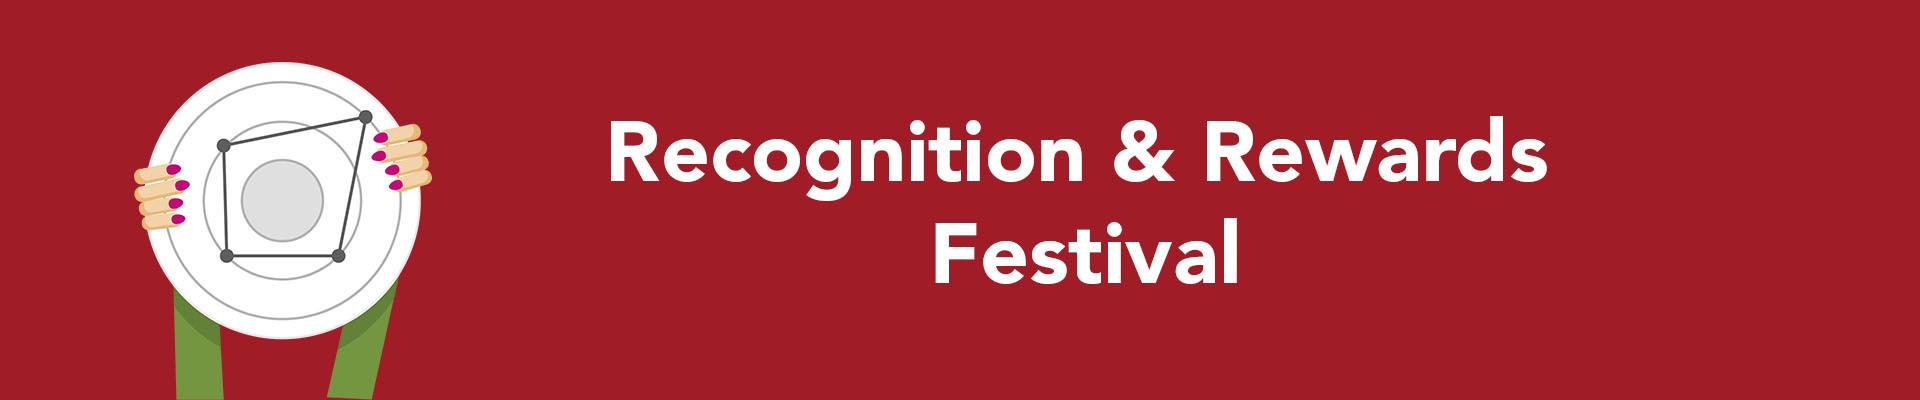 Recognition & Rewardsfestival